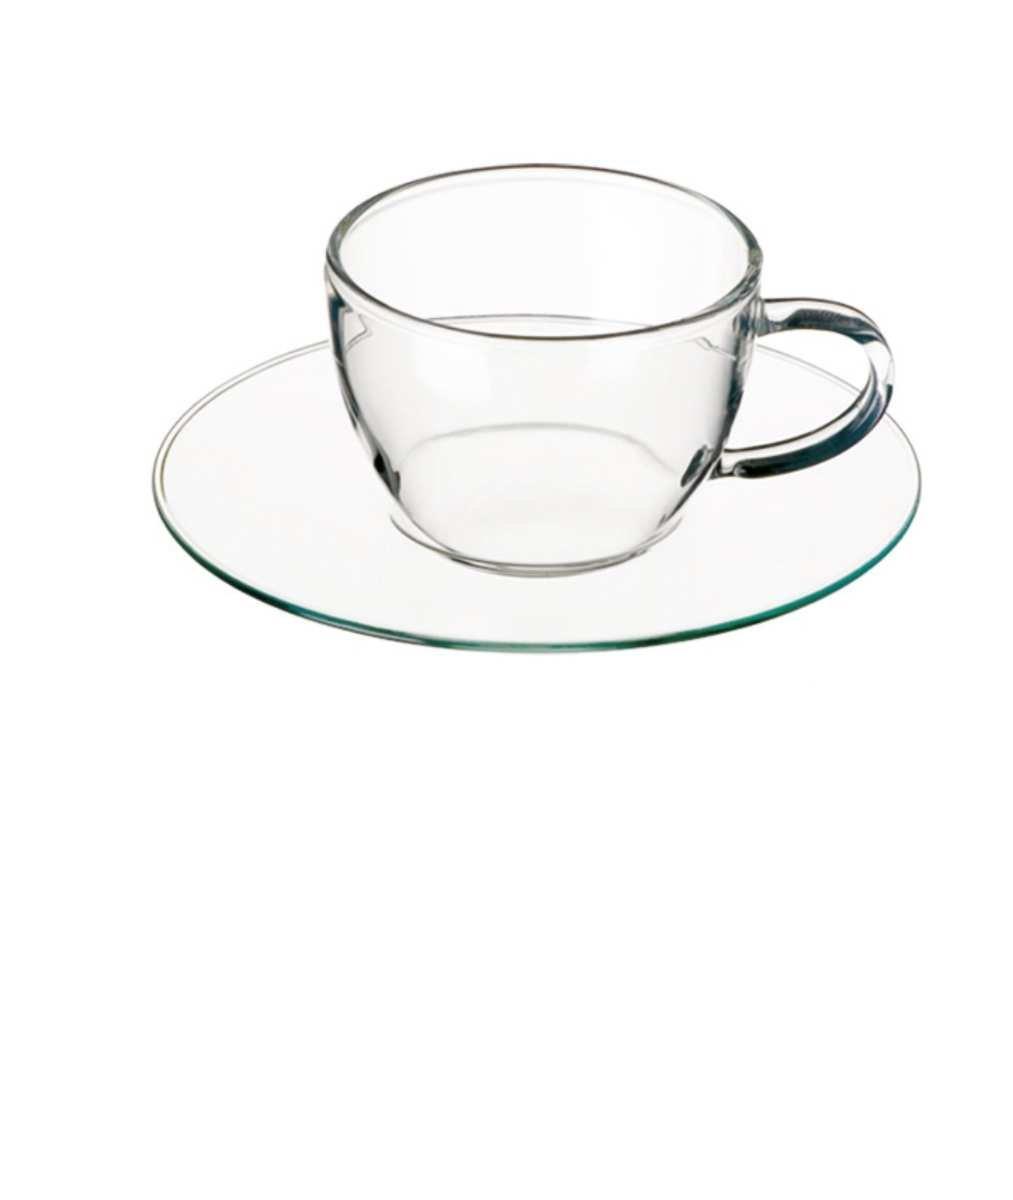 Bohemia Crystal 093/006/028 Piccolo Espresso Cup 100 ml Set of 4 Bohemia Cristal